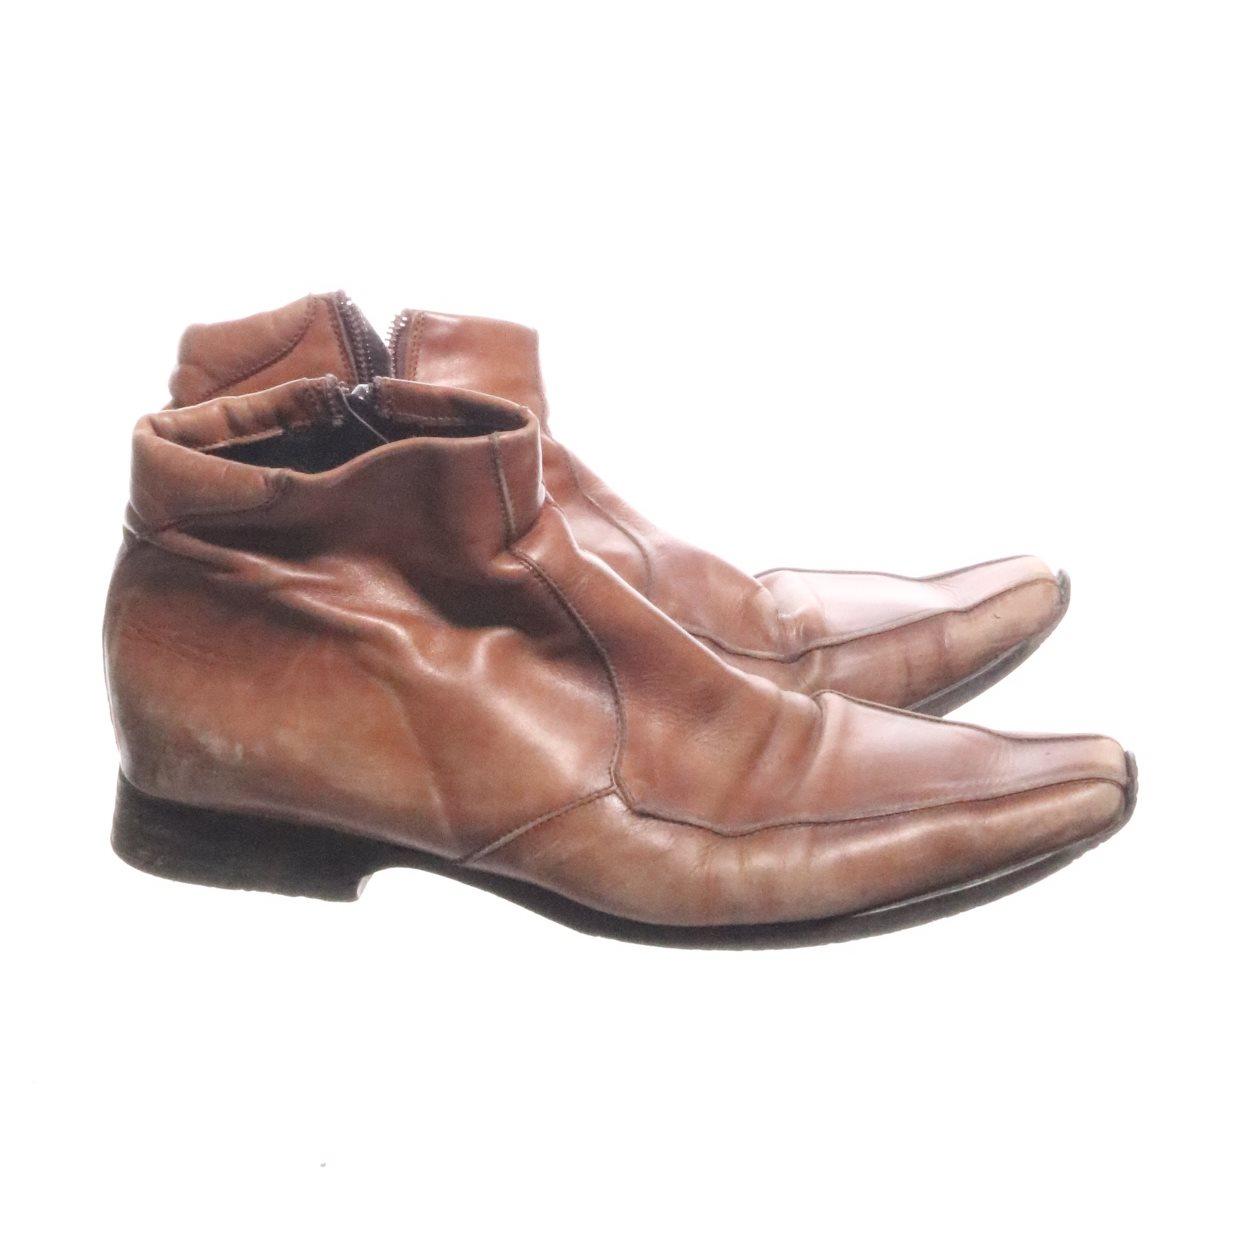 691744591da Parisienne, Boots, Strl: 36 1/2, Brun (334114117) ᐈ Sellpy på Tradera